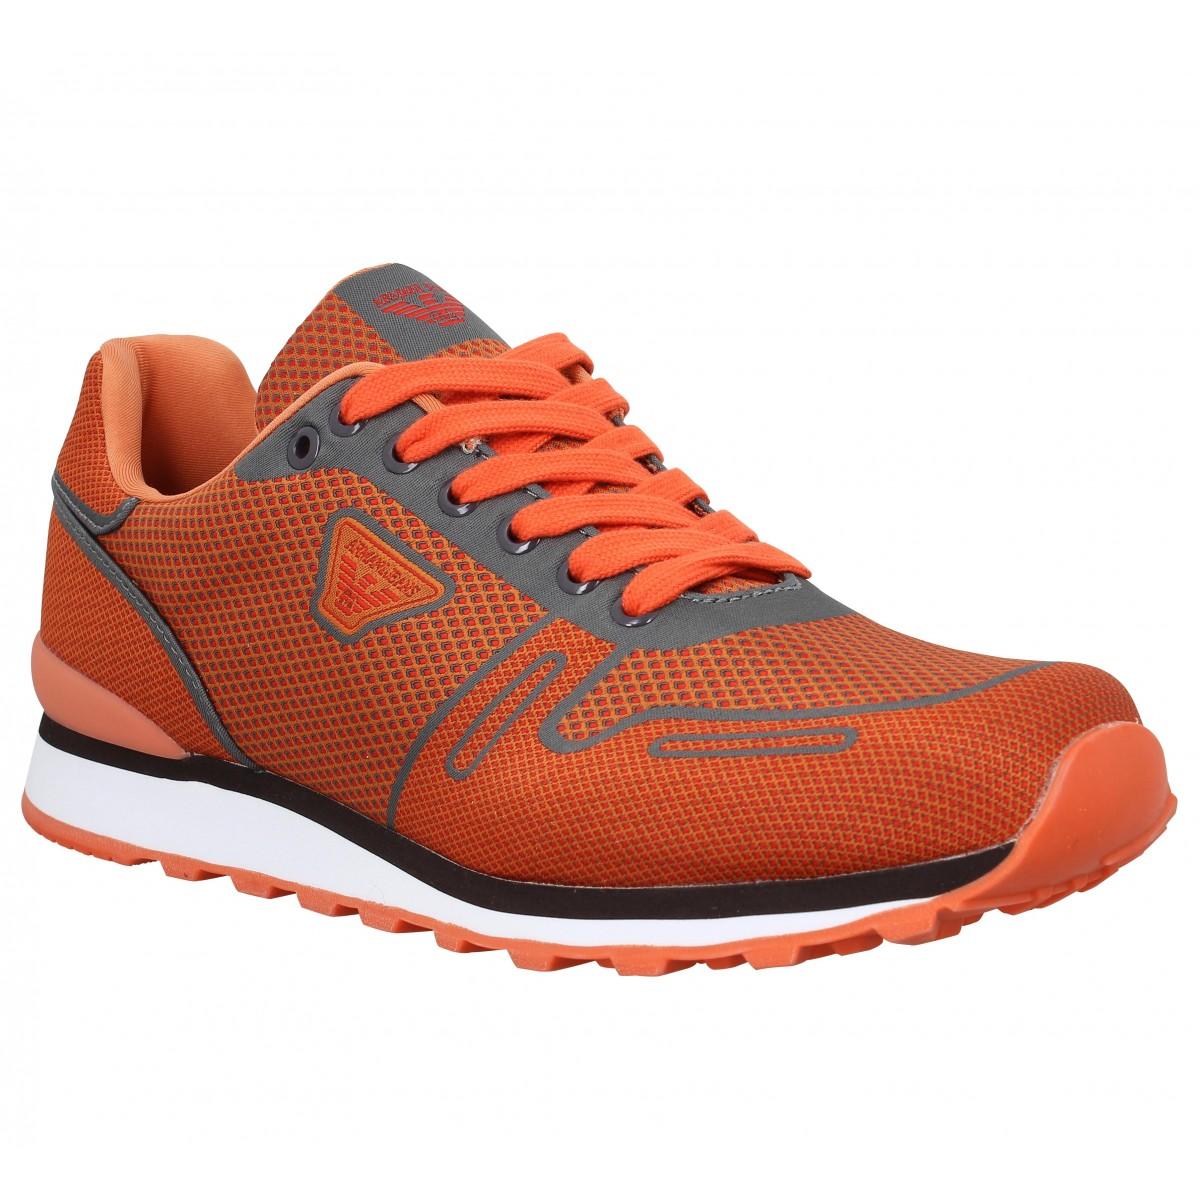 Armani Jeans Homme 9326-40-orange